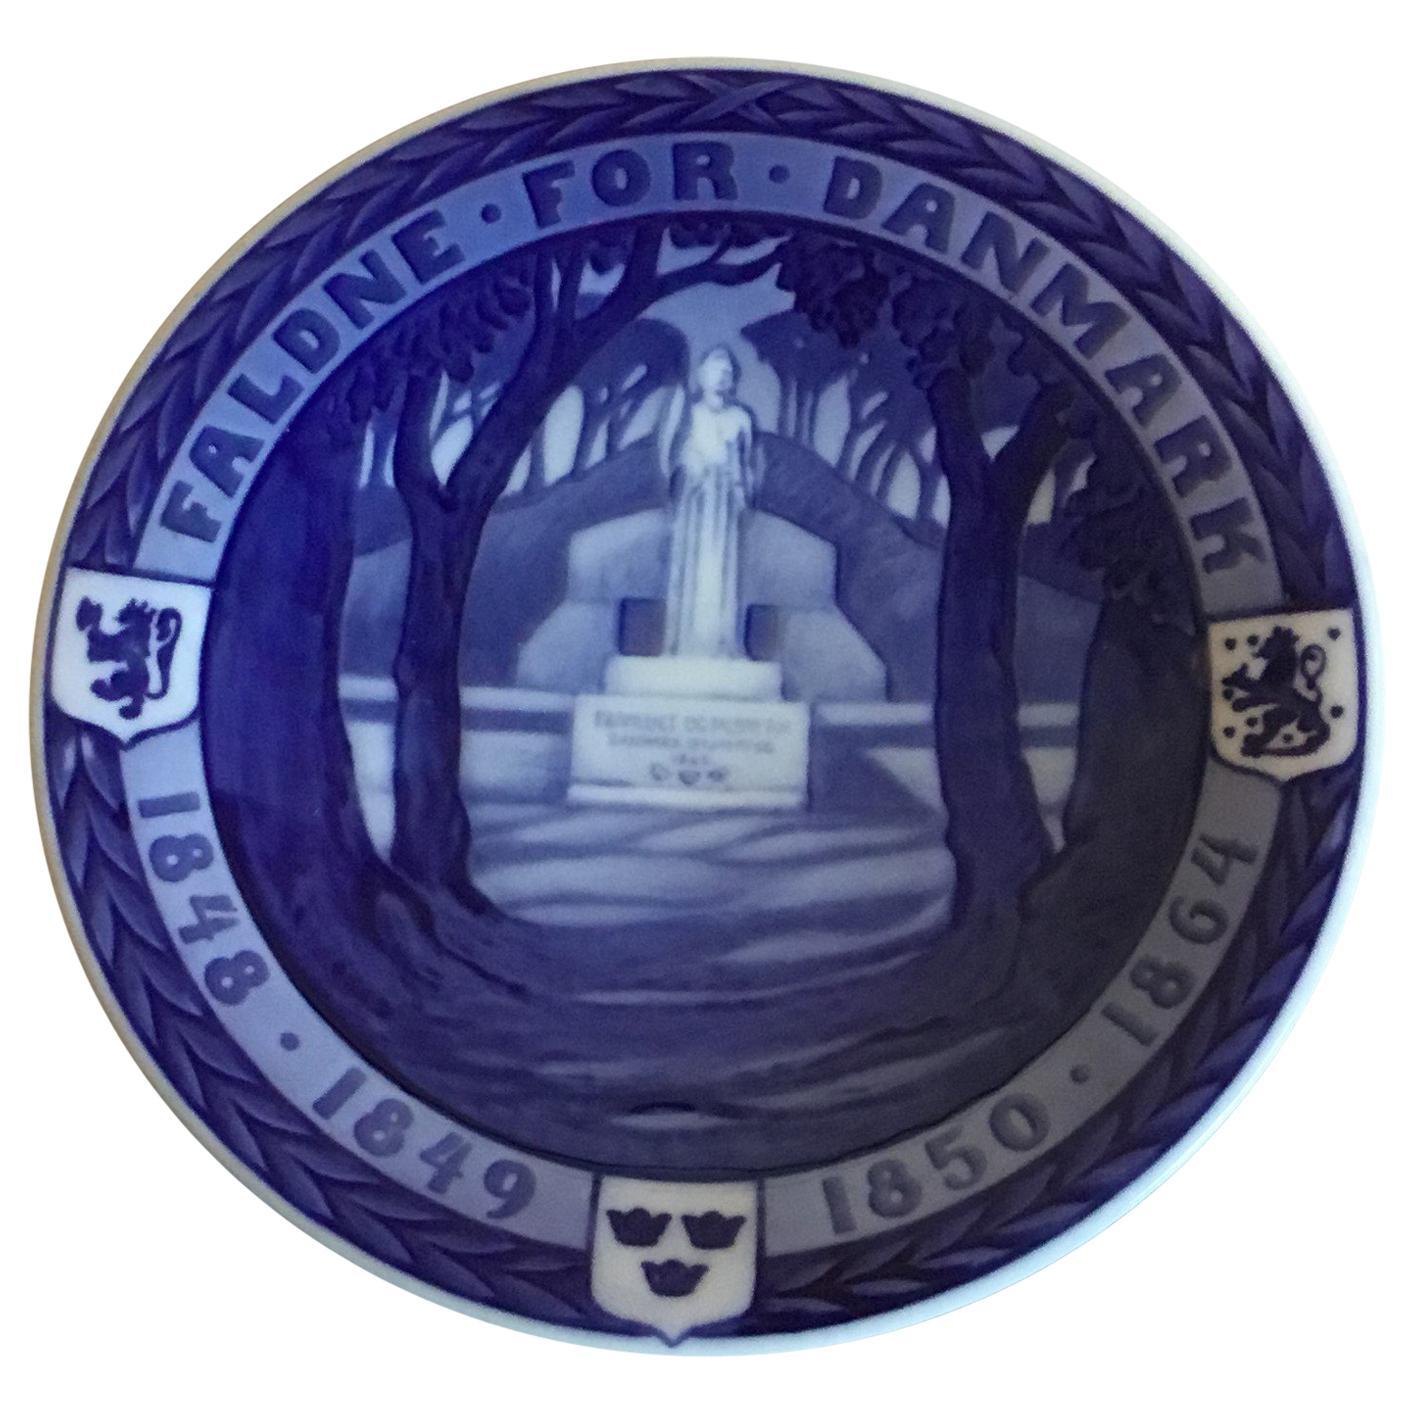 Royal Copenhagen Commemorative Plate from 1920 RC-CM192